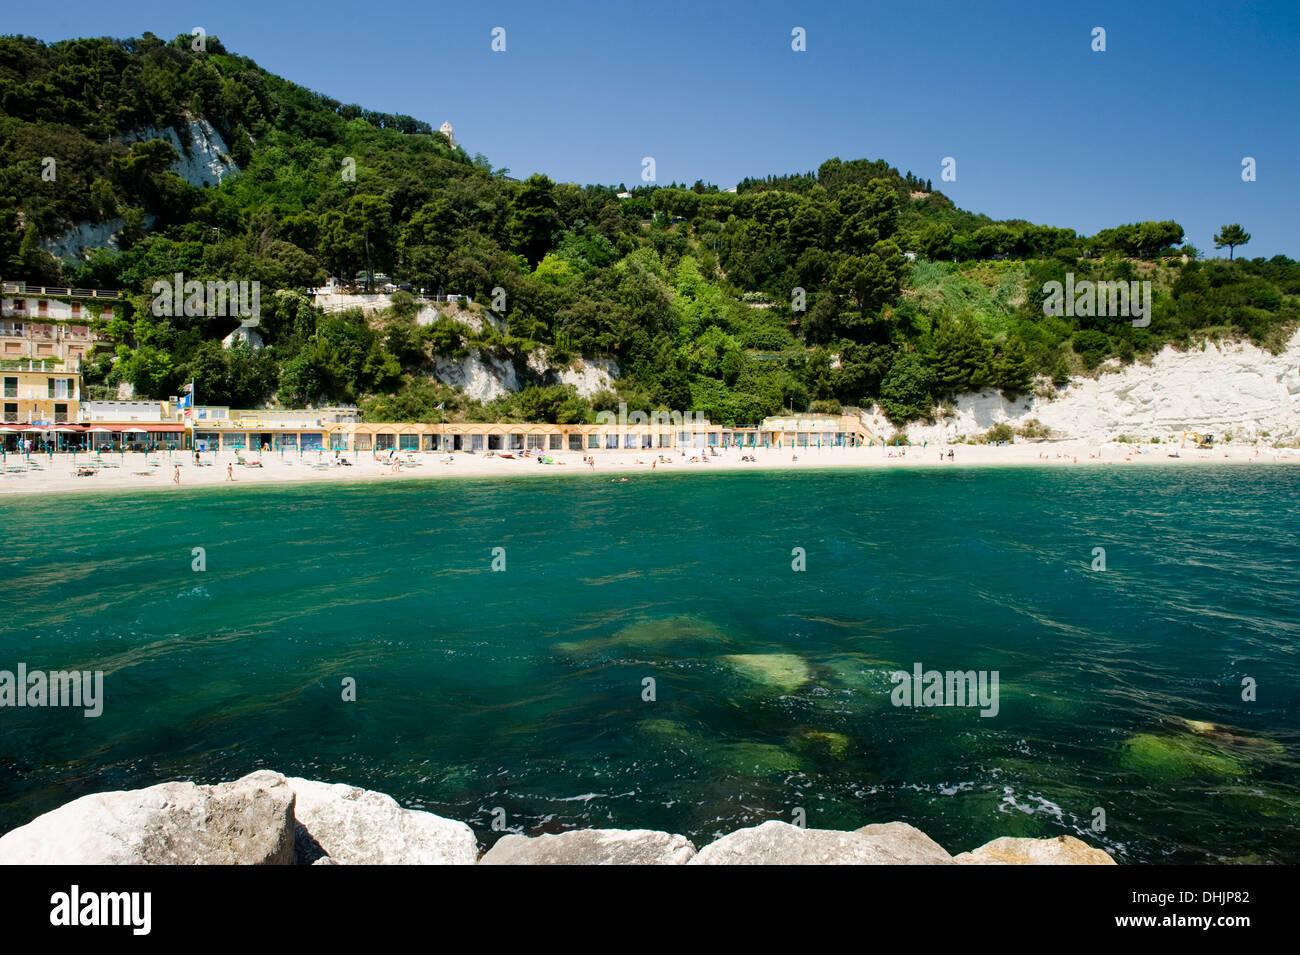 Sirolo beach, Sirolo, Marches, Marken, Italy - Stock Image